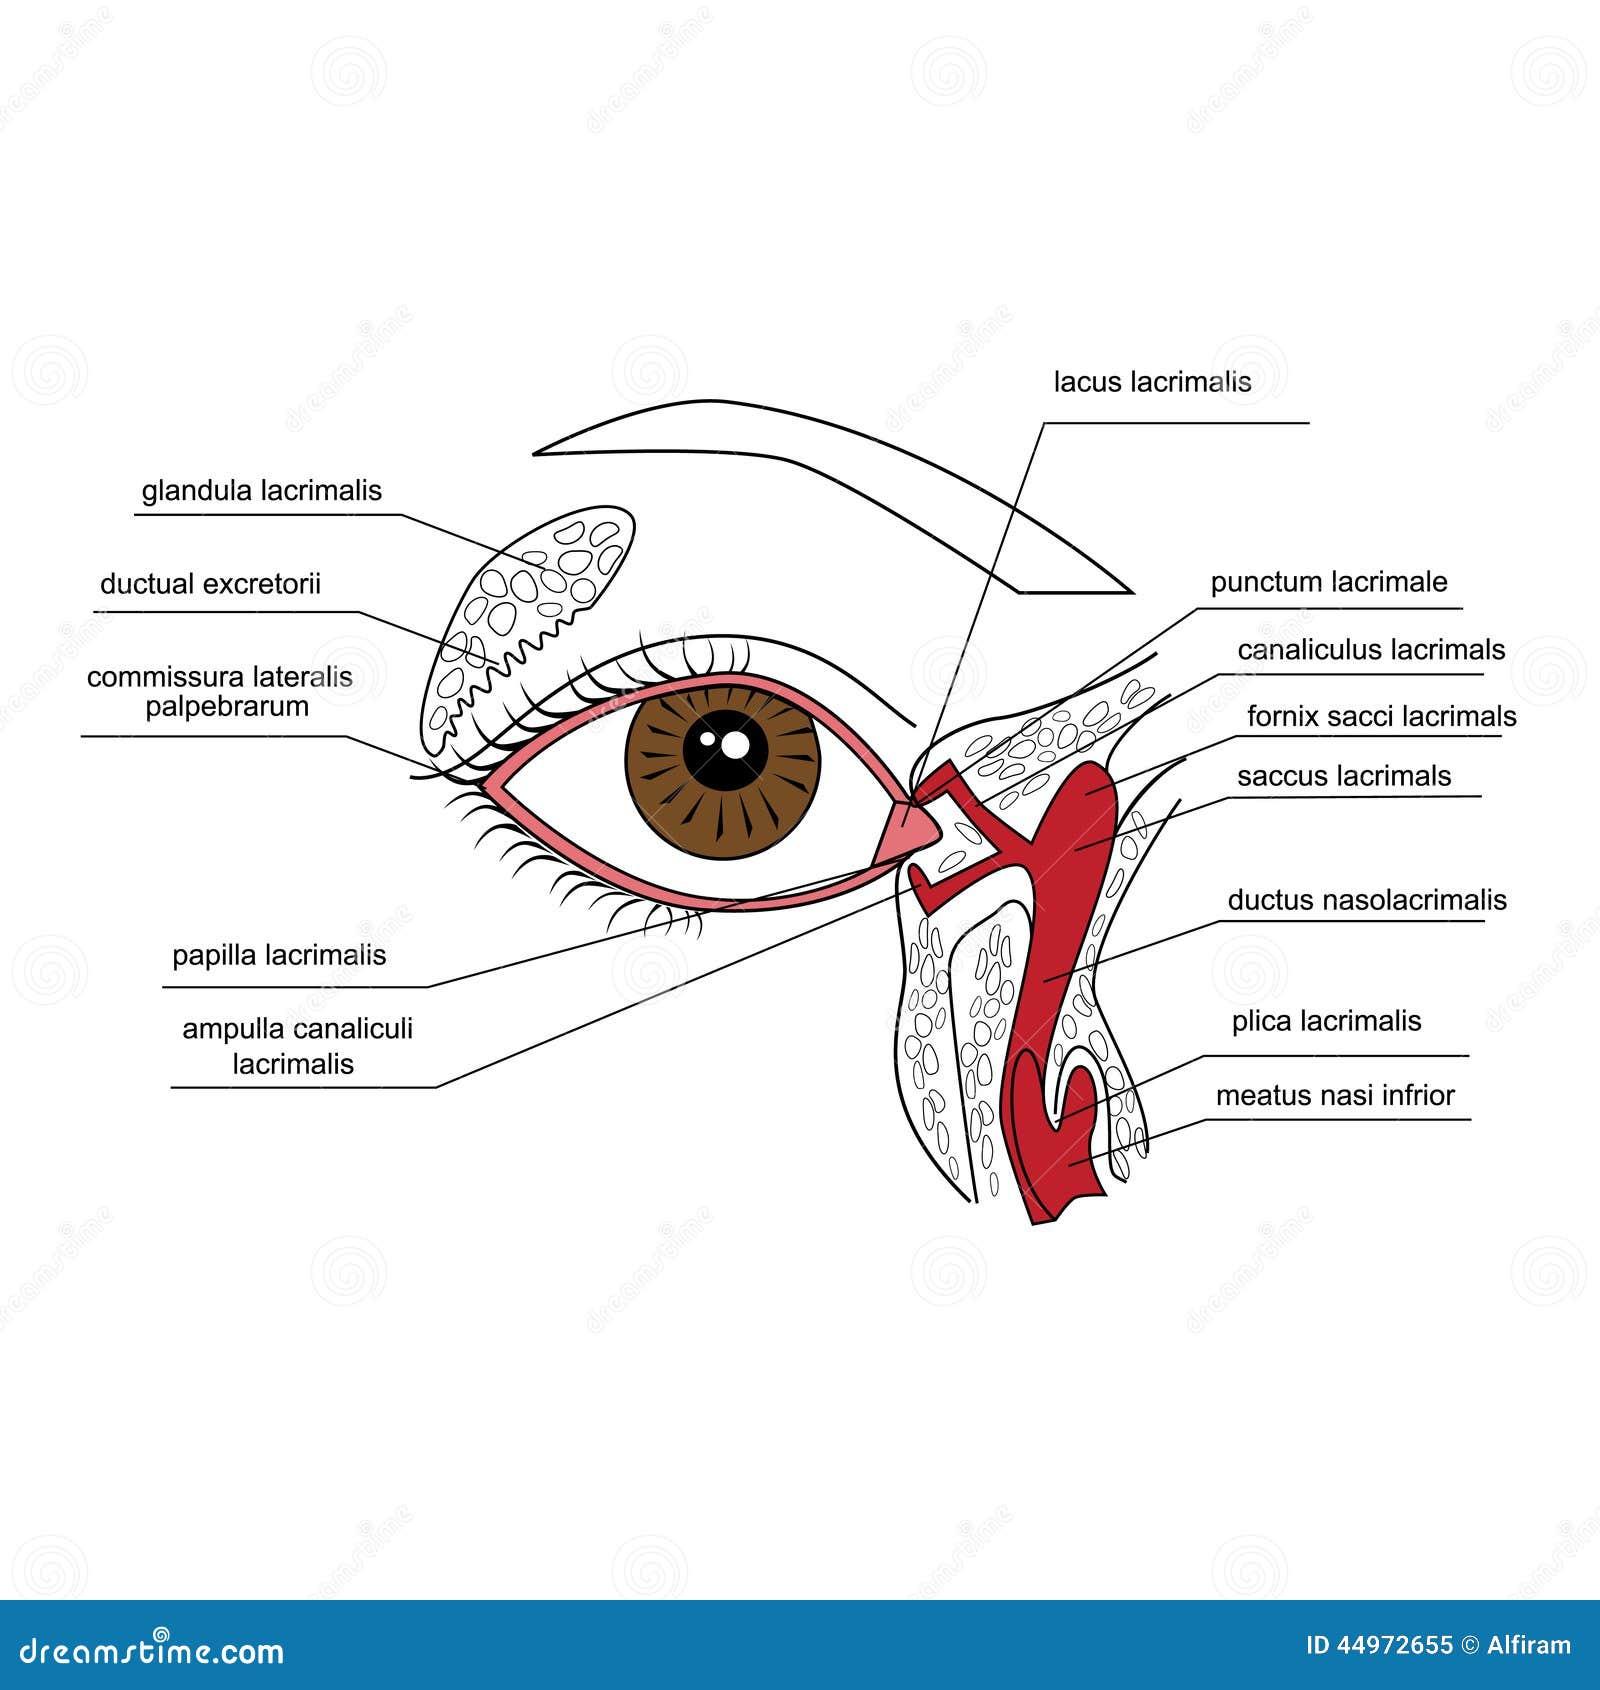 Lacrimal apparatus stock vector. Illustration of health - 44972655